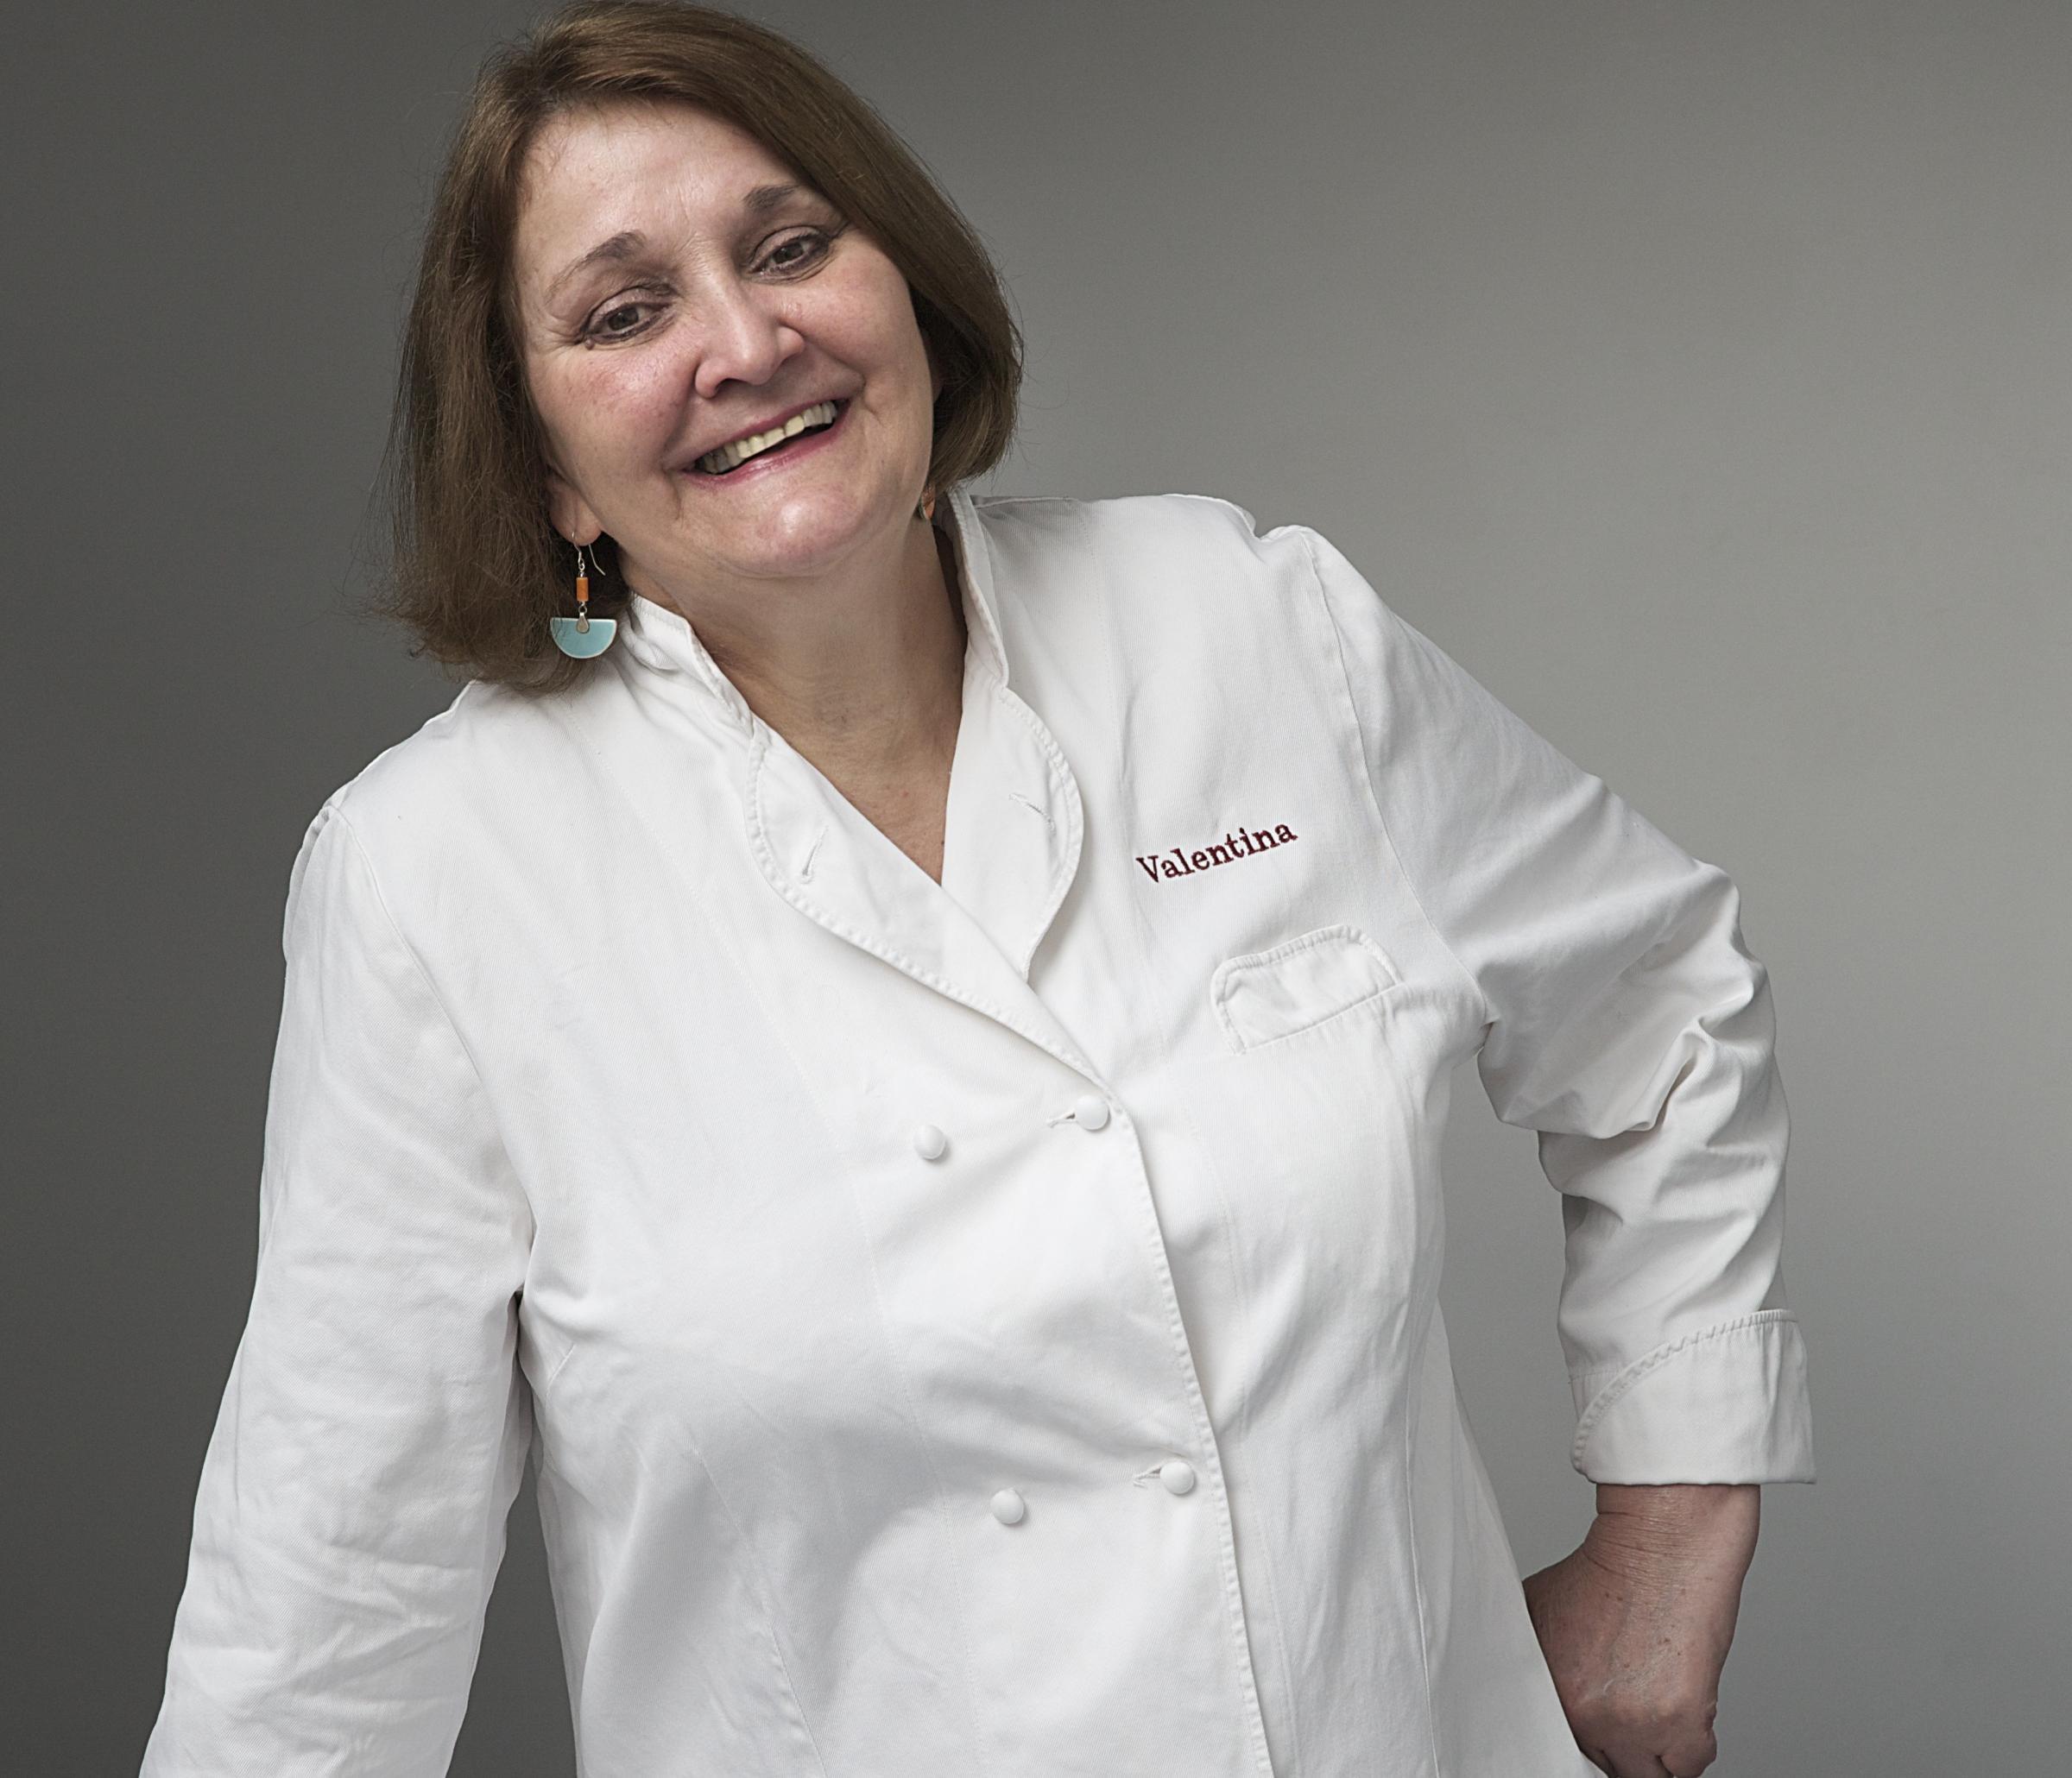 Chef and food writer Valentina Harris heading to York - York Press